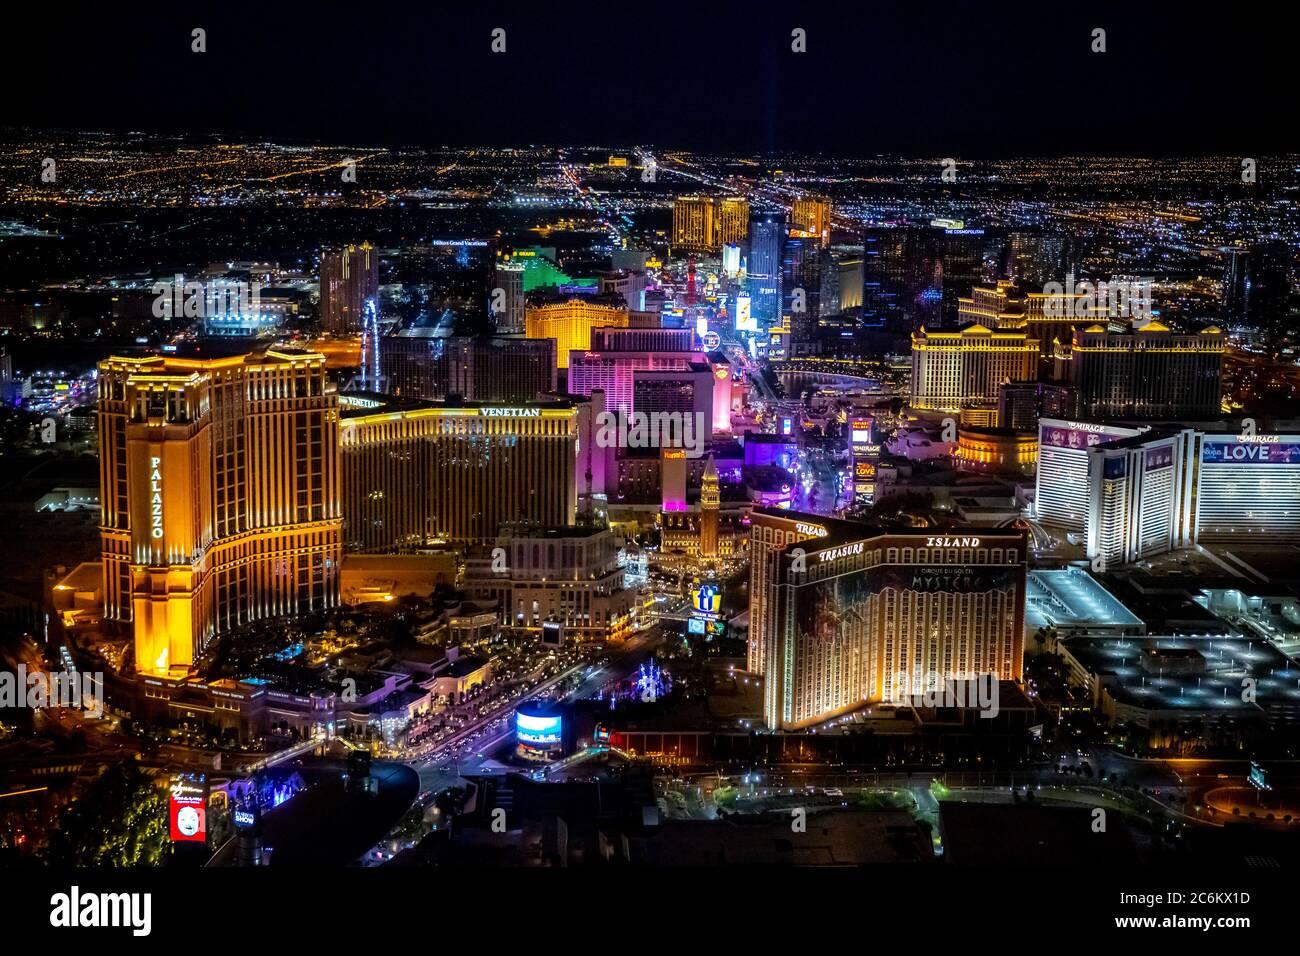 Las Vegas Nv Usa 9th July 2020 Aerial Views Of The Las Vegas Strip In Las Vegas Nv On July 9 2020 Credit Erik Kabik Photography Media Punch Alamy Live News Stock Photo Alamy